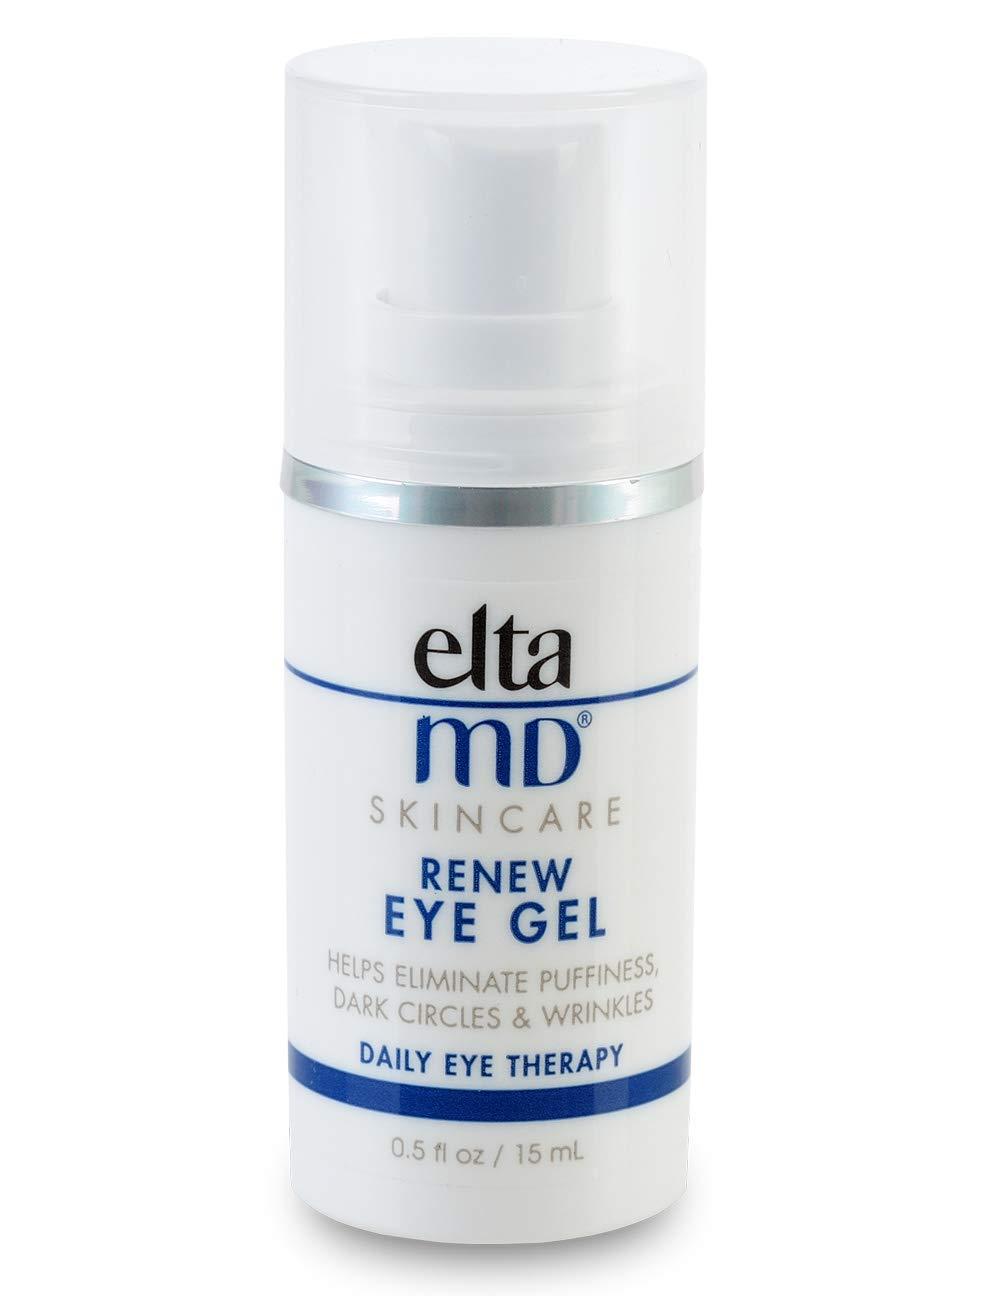 EltaMD Renew Eye Gel for Dark Circles, Fine Lines Around Eyes, Clinically-Proven Eye Cream, Oil-free, 0.5 oz